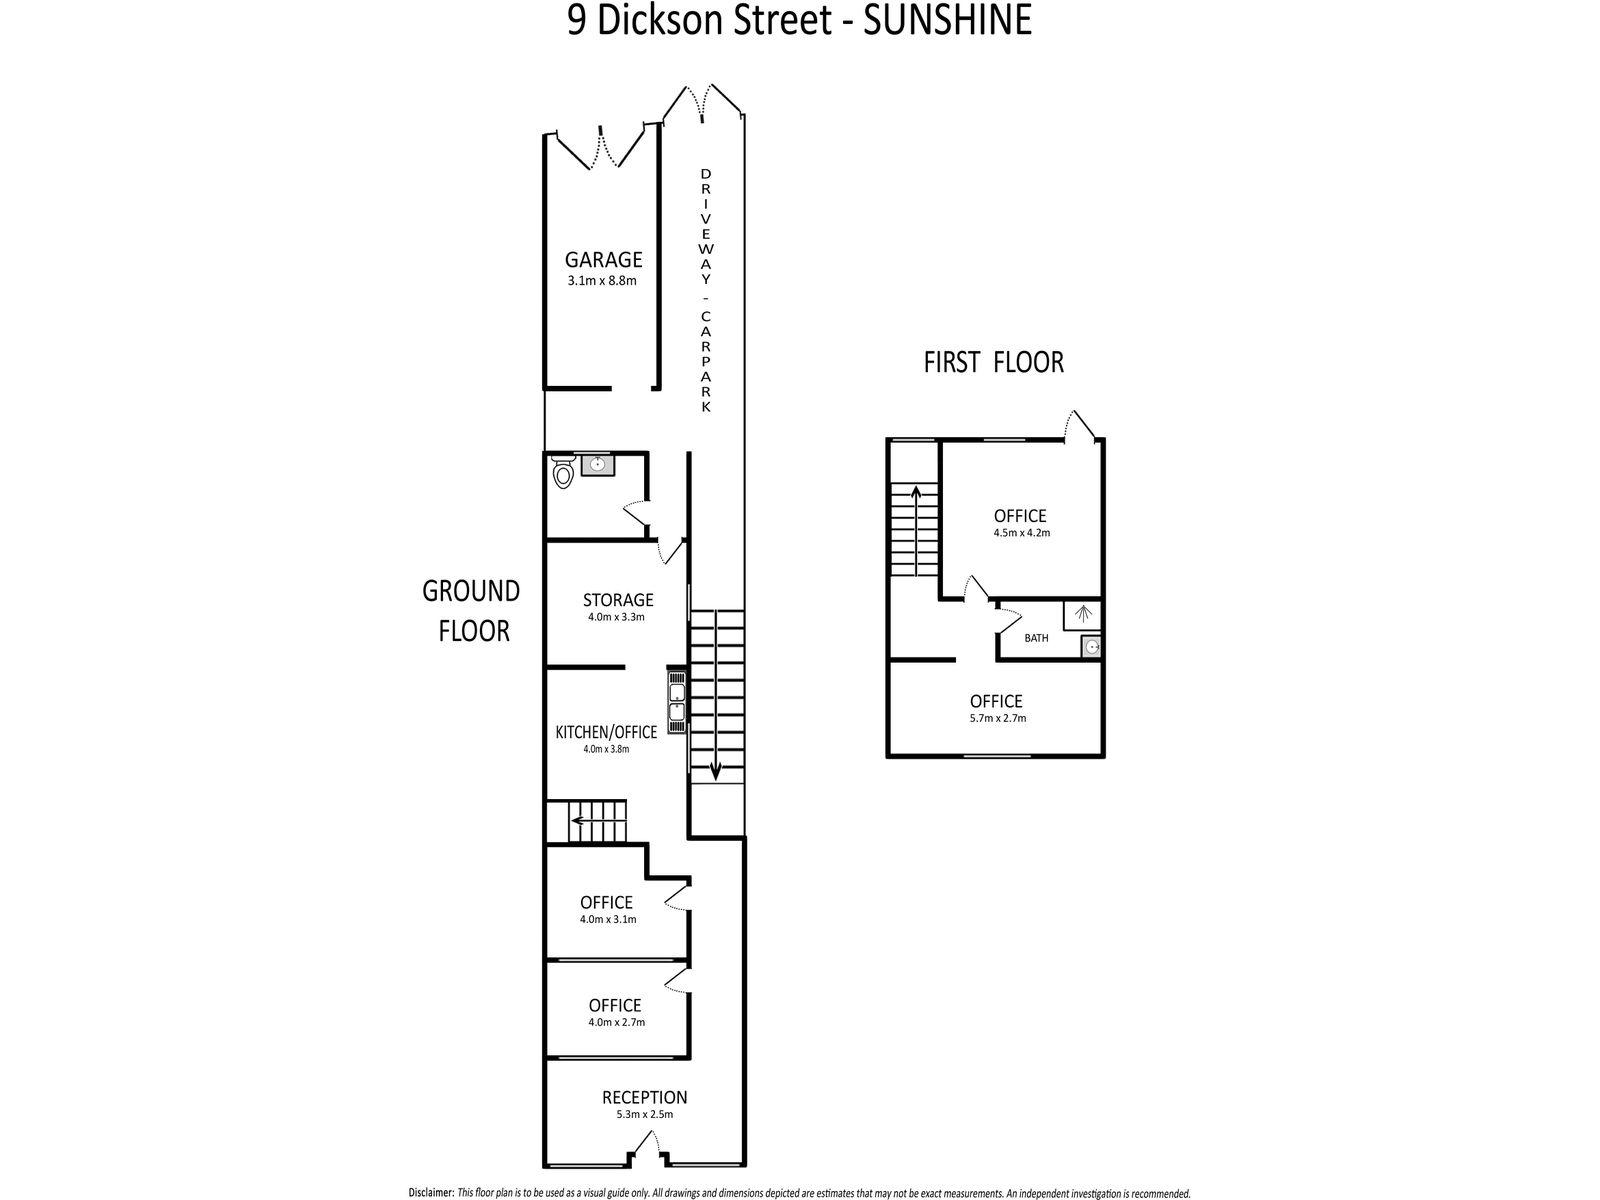 9 Dickson Street, Sunshine